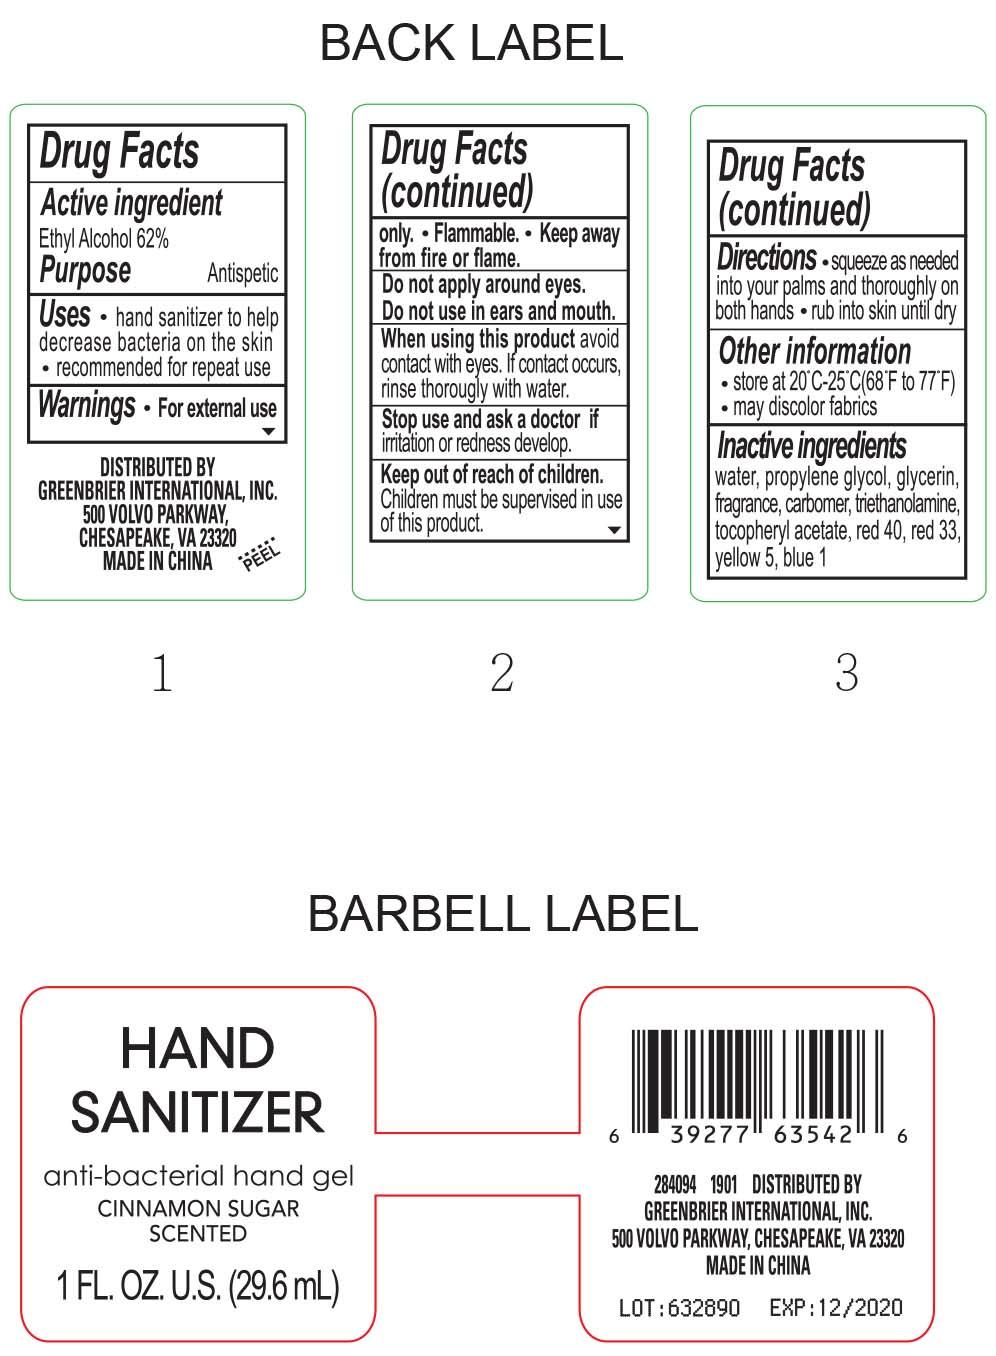 Is Cinnamon Sugar Scented Hand Sanitizer | Ethyl Alcohol Gel safe while breastfeeding